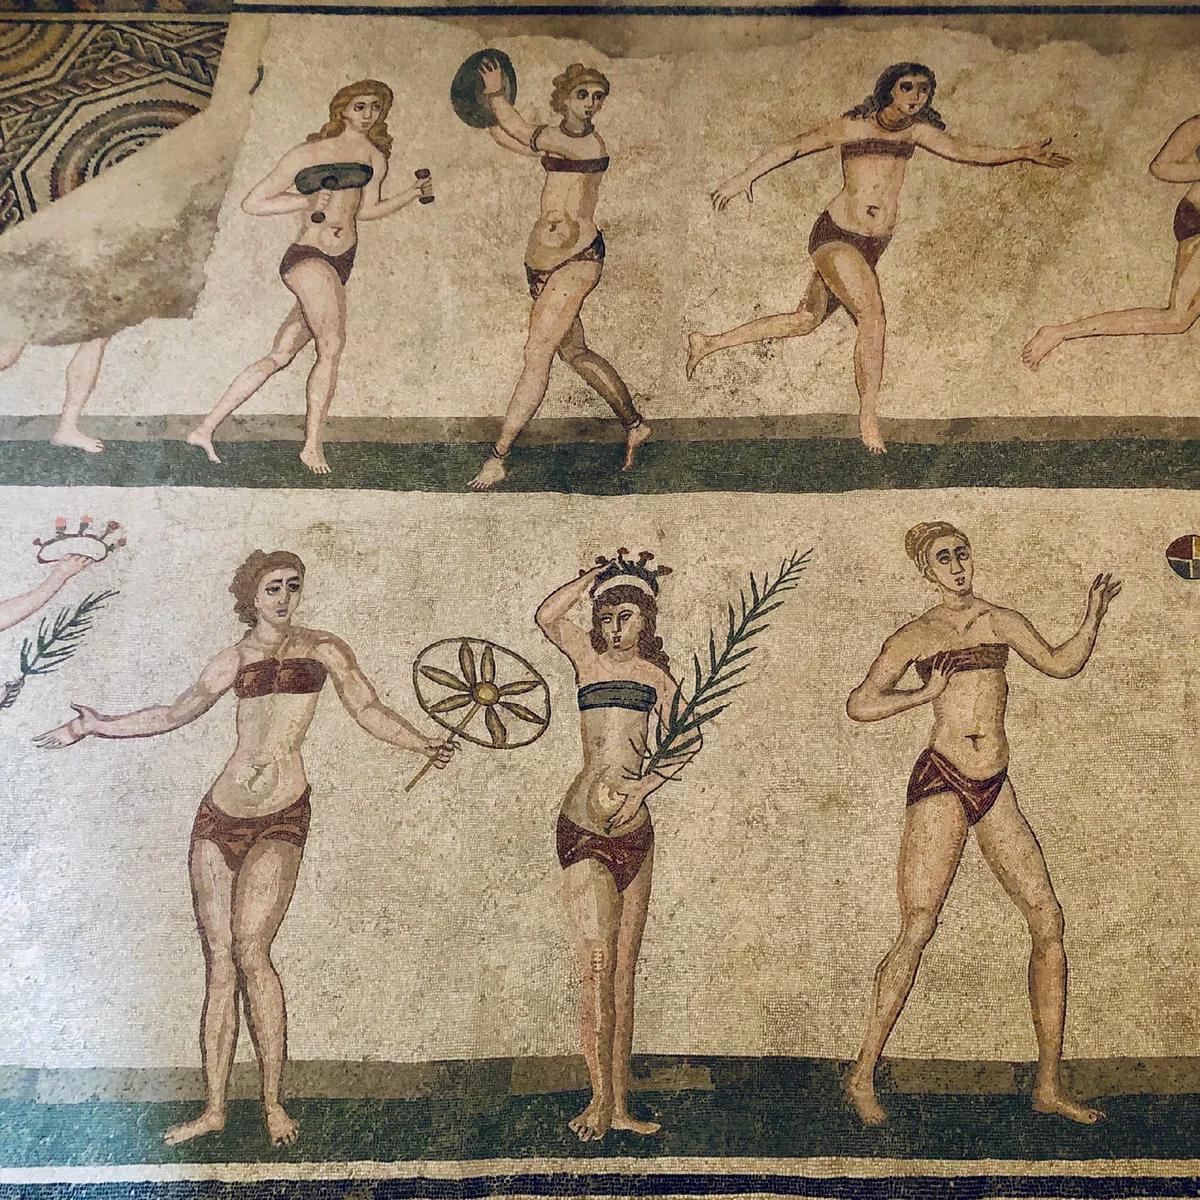 Девушки в бикини на древнеримской вилле | Пикабу